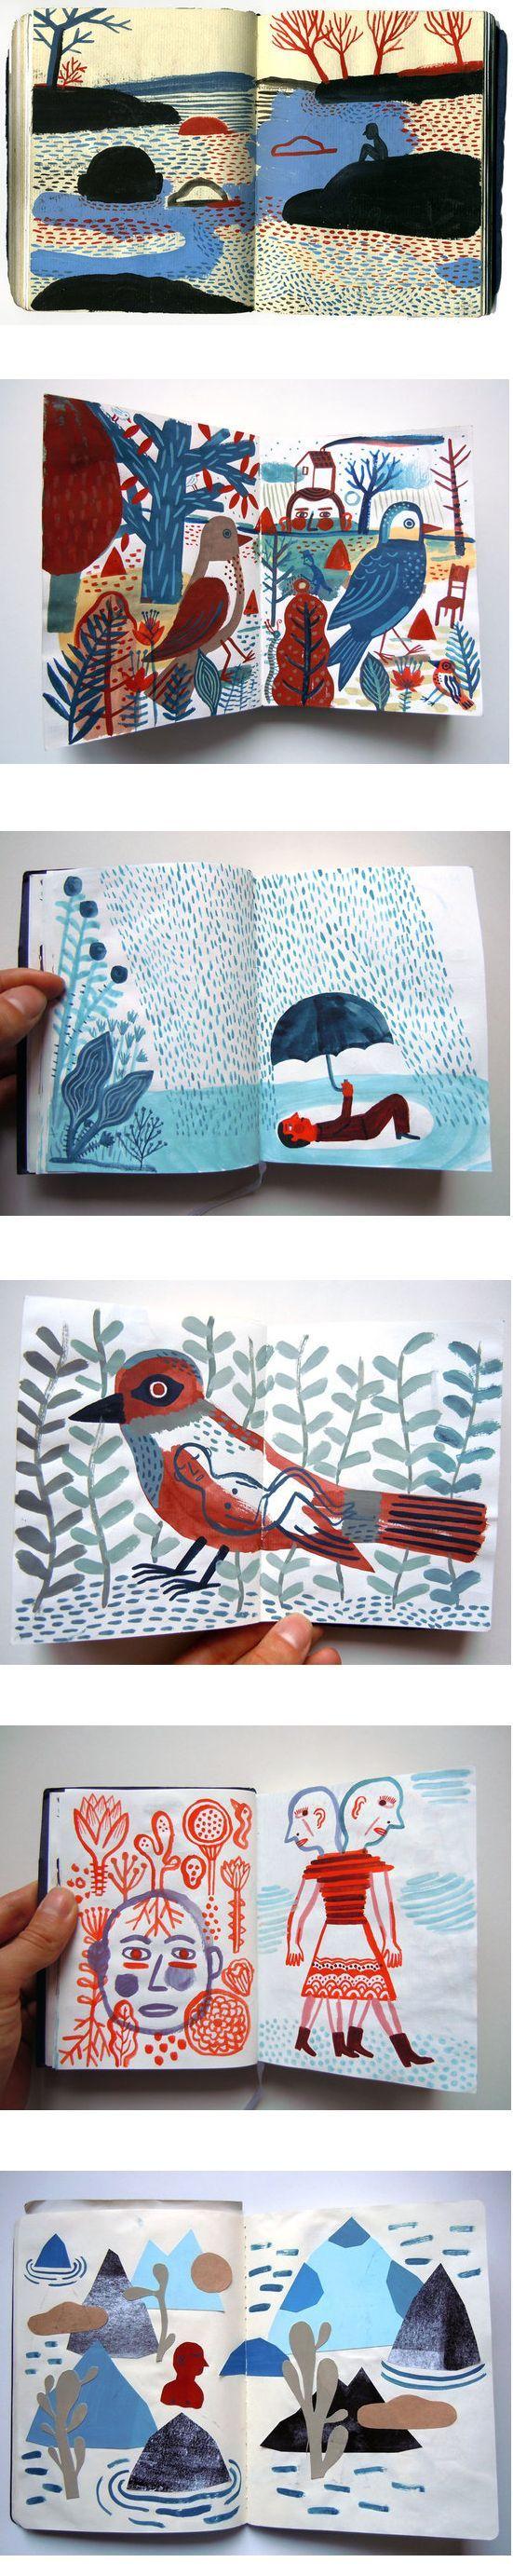 sketchbook by Laurent Moreau via theartcake.com #Kids